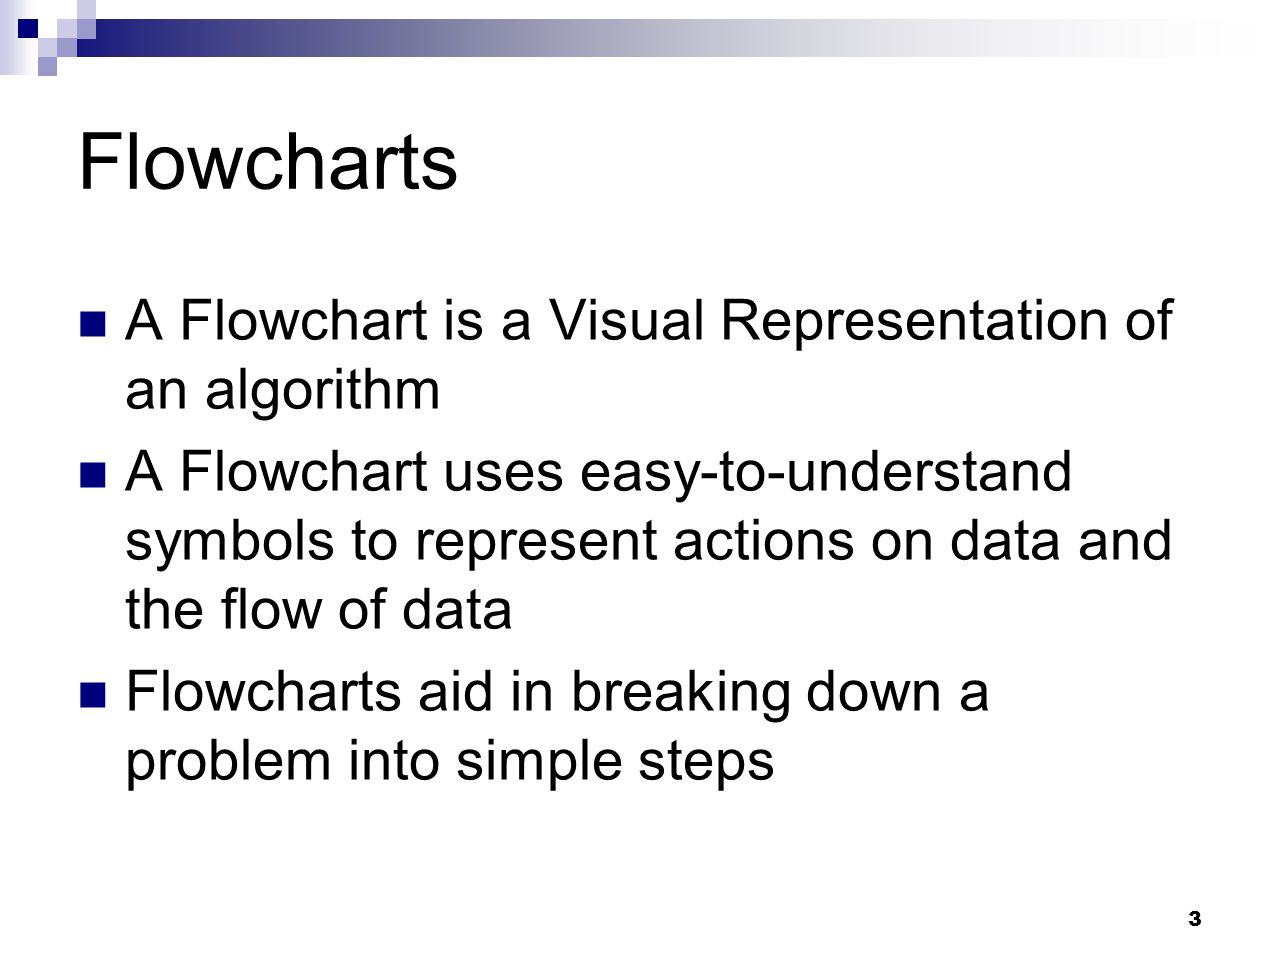 Flowcharts A Flowchart is a Visual Representation of an algorithm